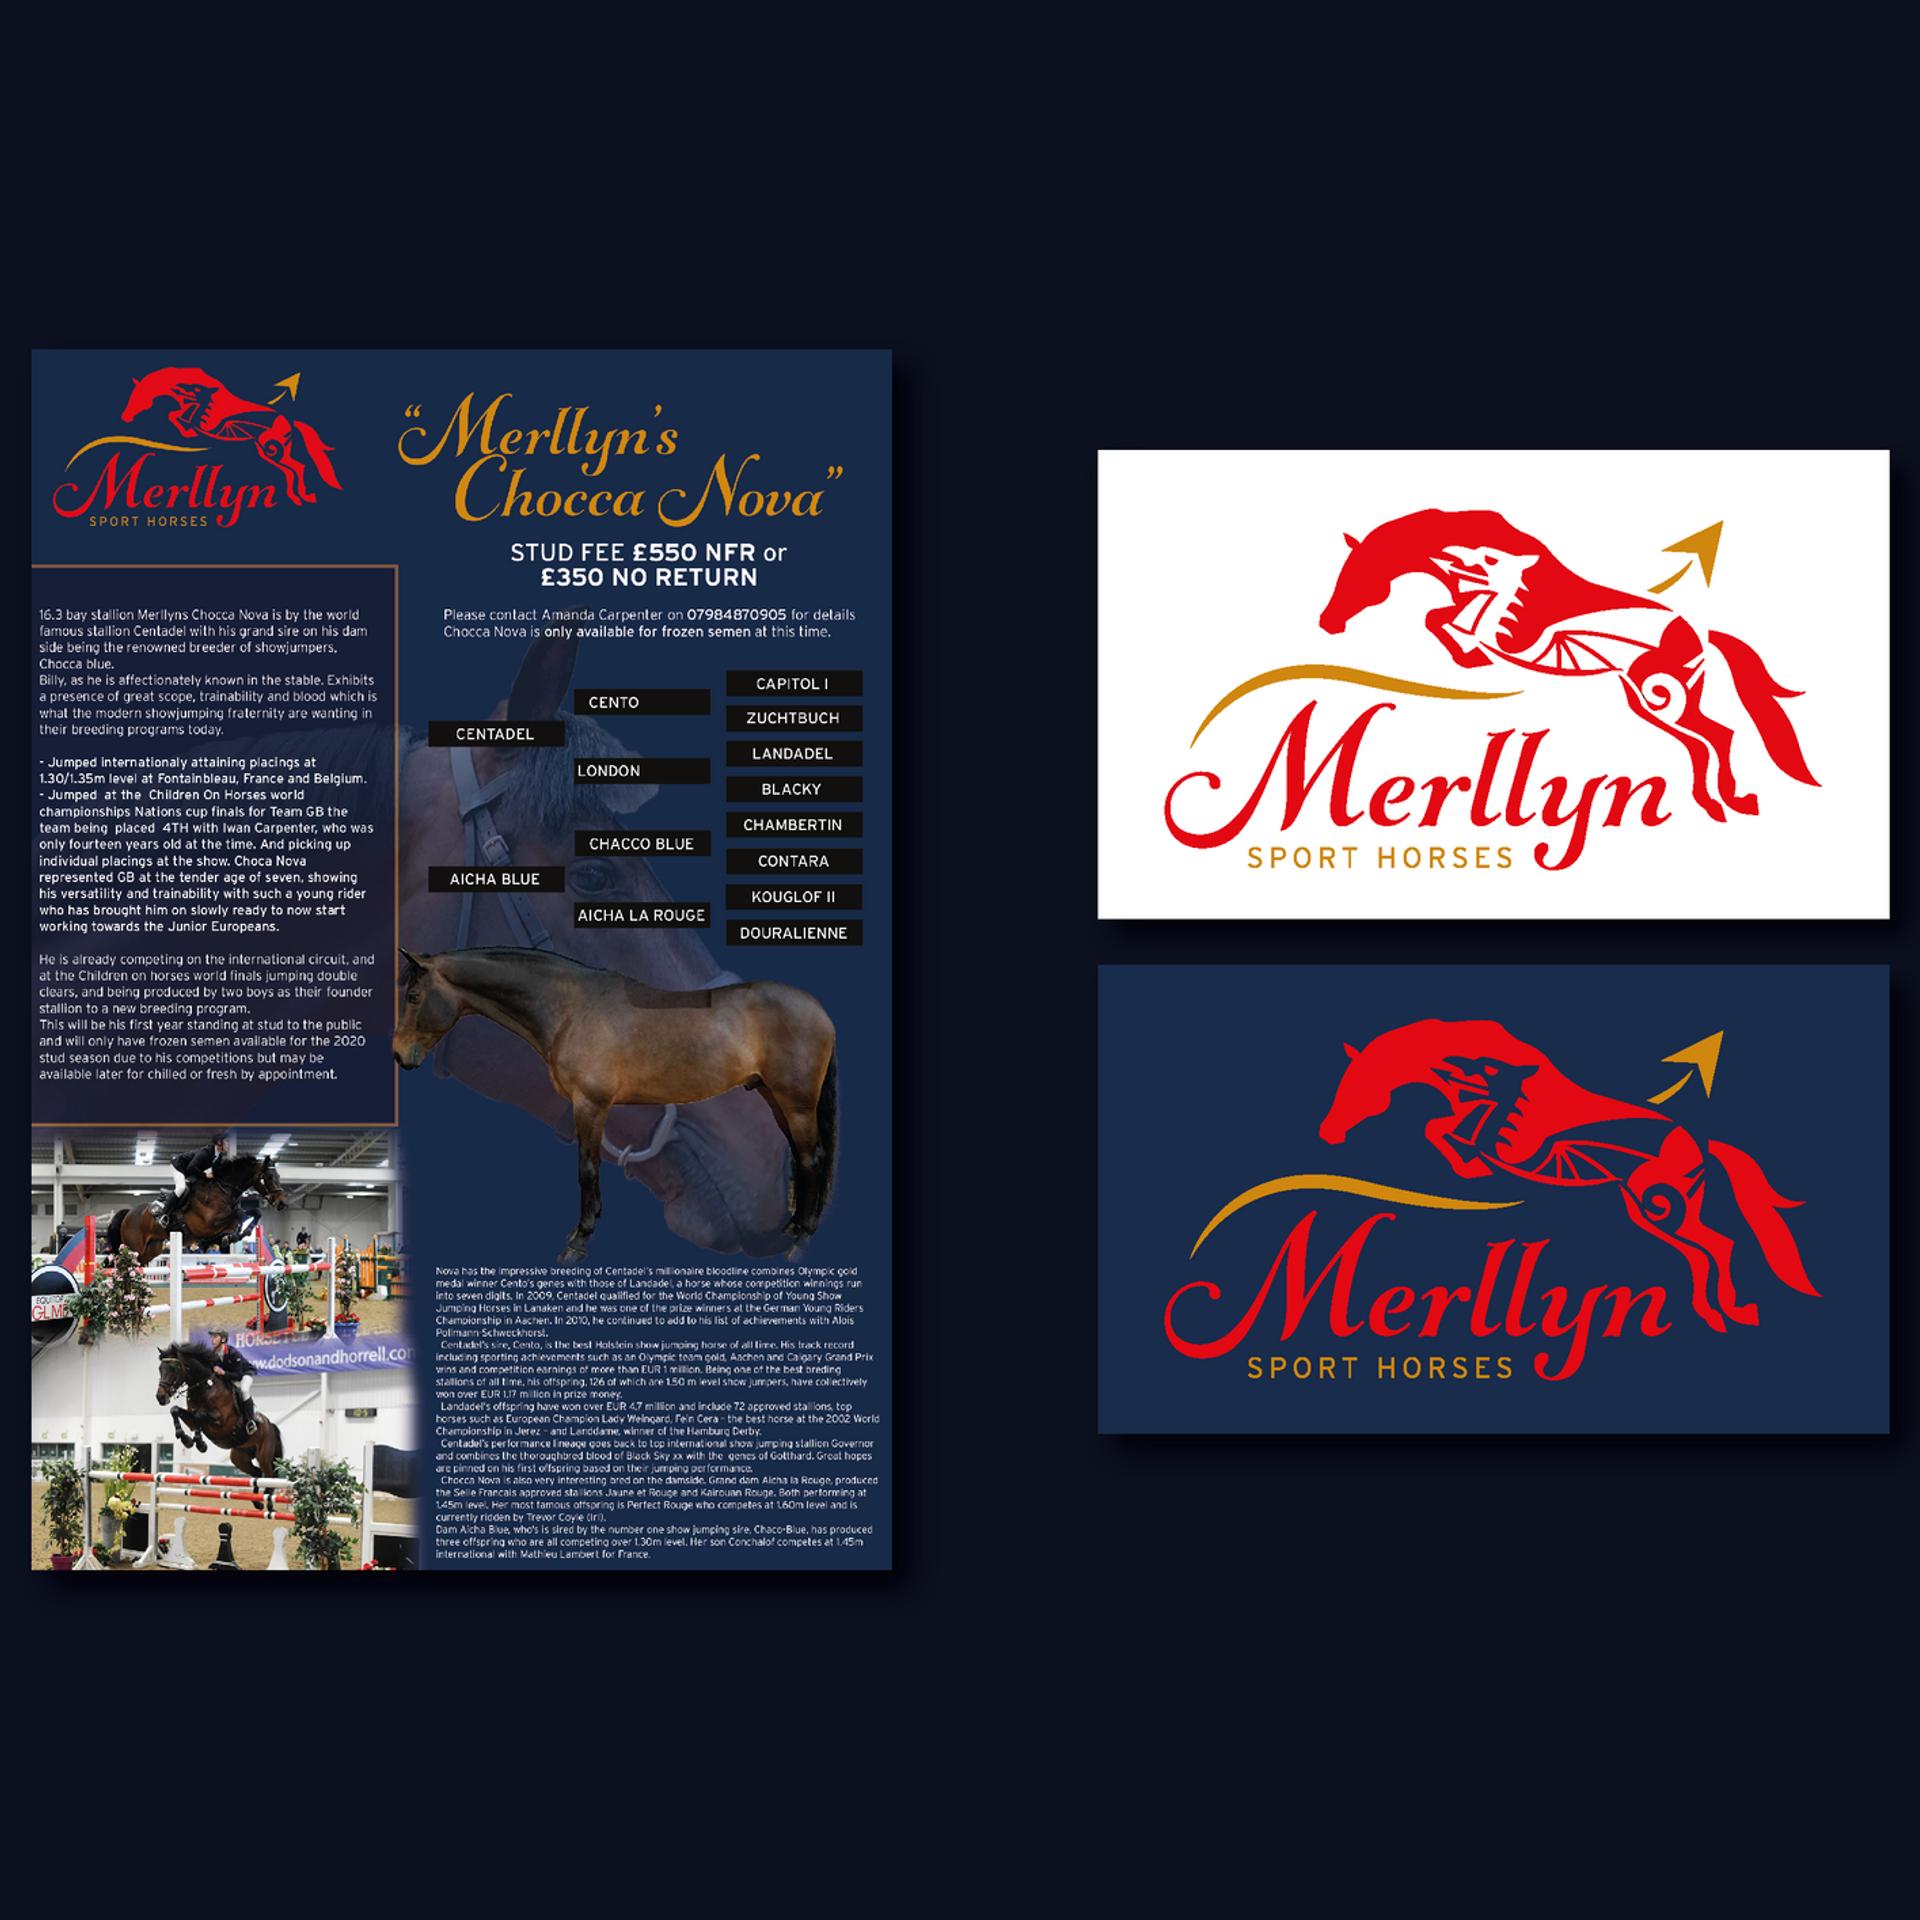 Merllyn Sport Horses